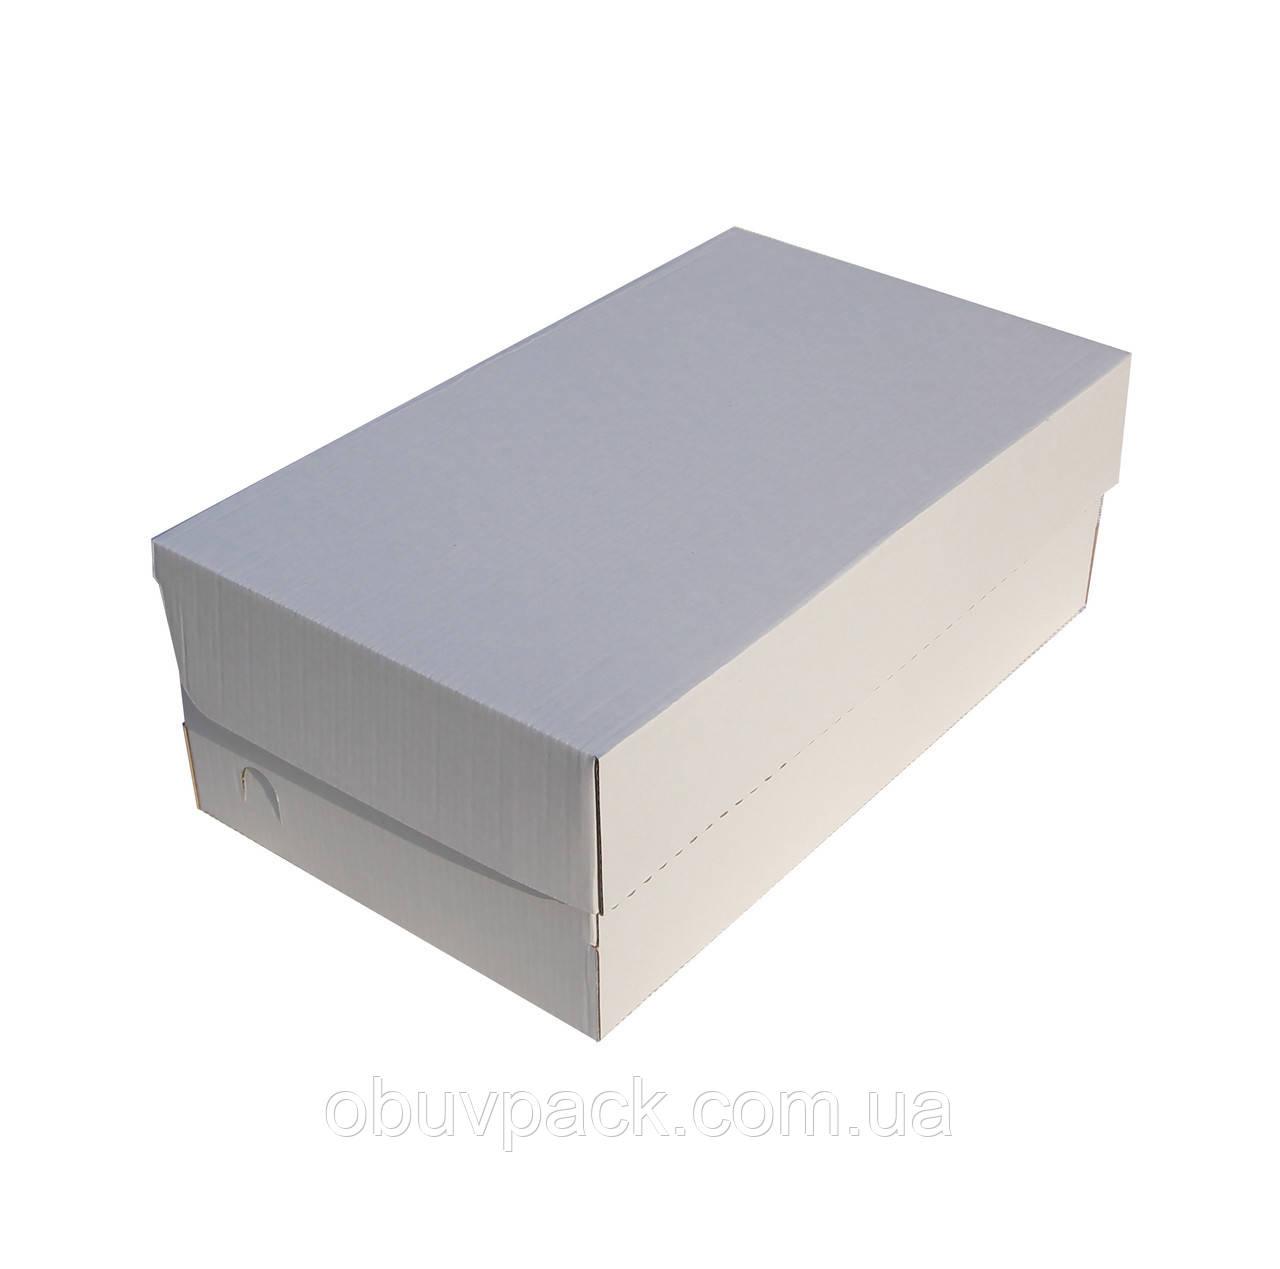 Коробка обувная 340х200х120 мужской туфель белая